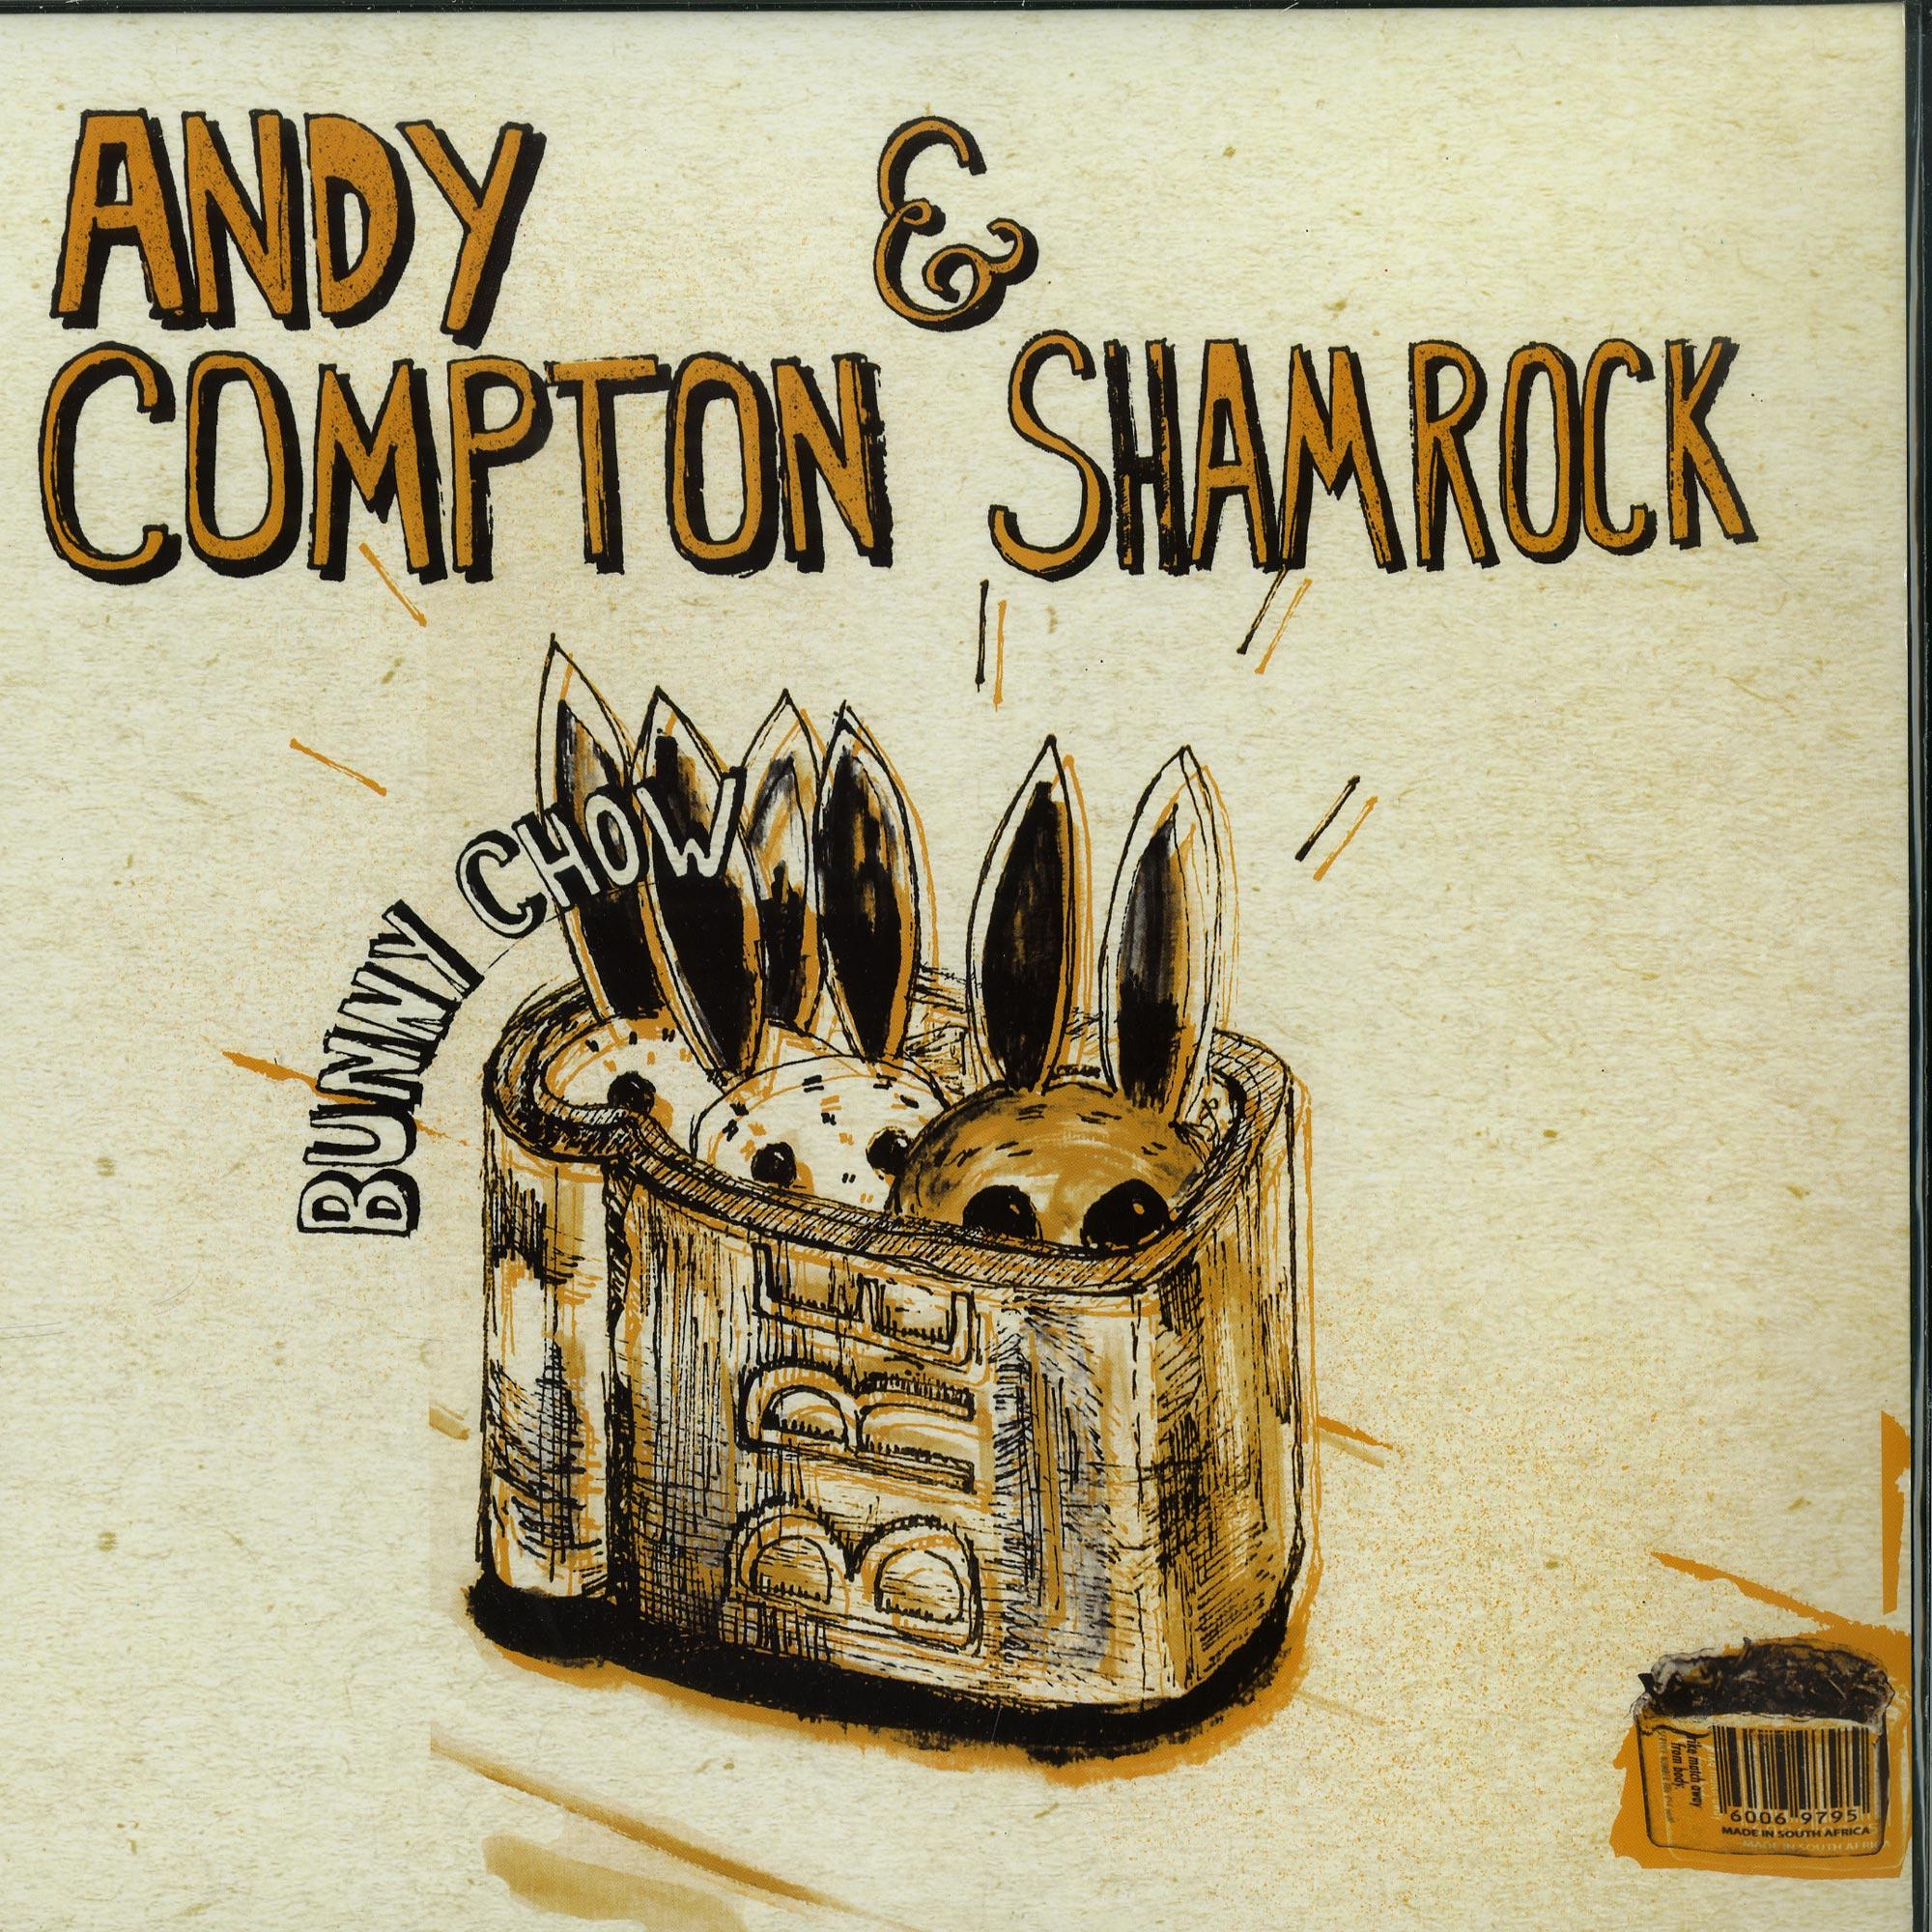 Andy Compton / Shamrock - BUNNY CHOW